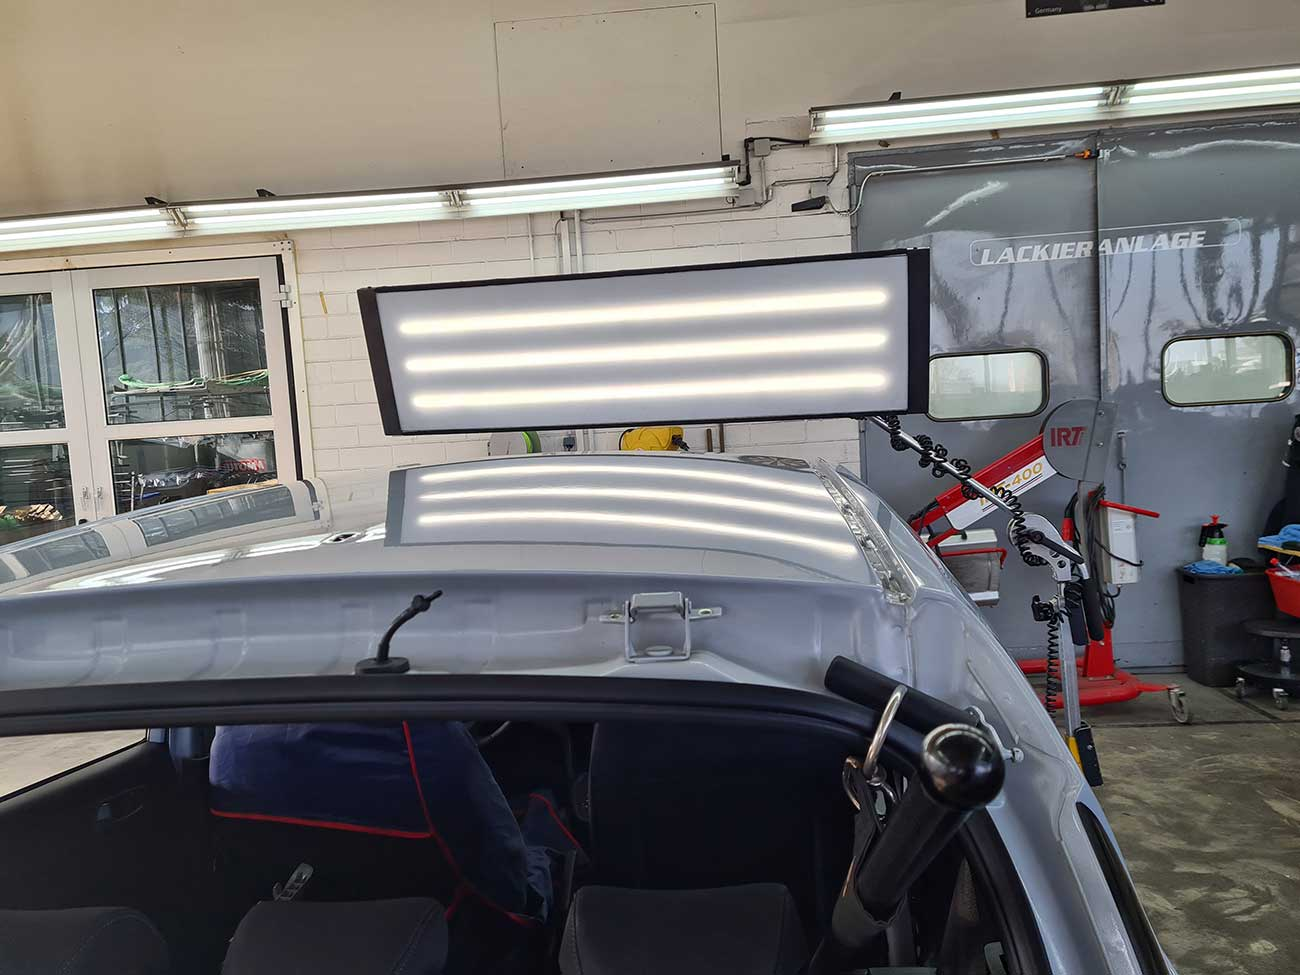 Reparierte-Schneelawine-auf-Fahrzeugdach- Beulendoktor Kassel- Die Fahrzeug-Ambulanz